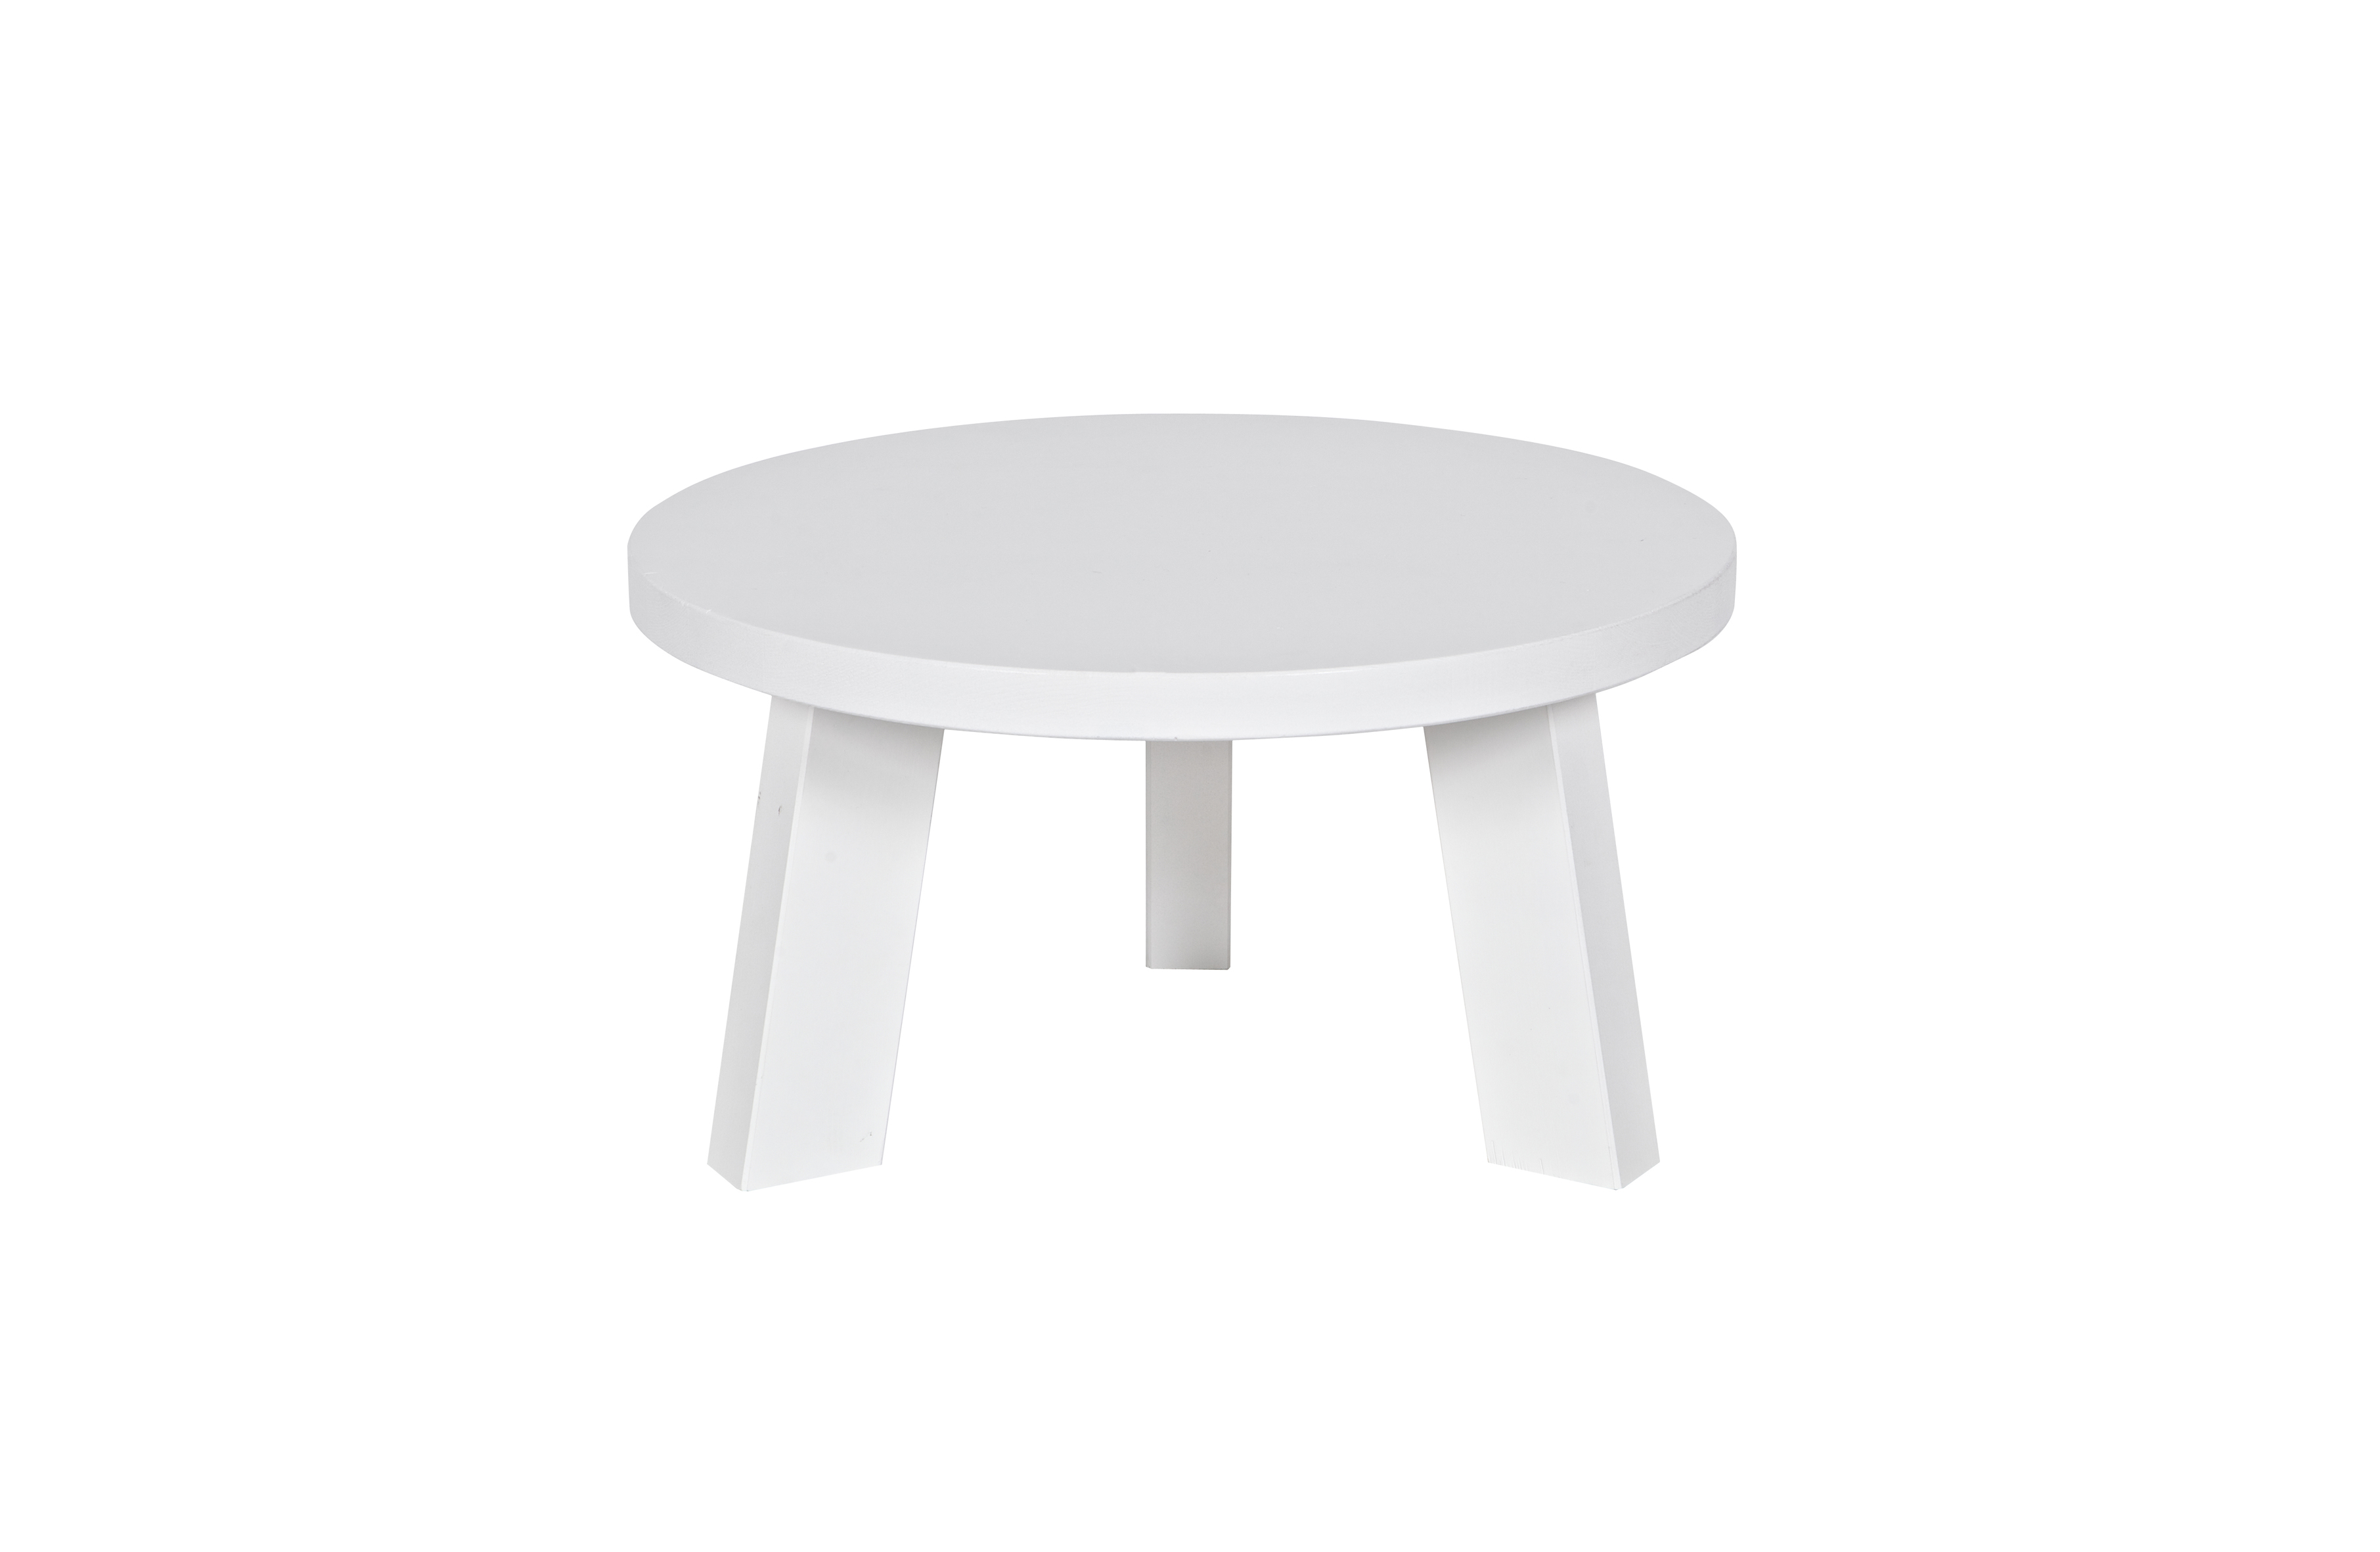 Kleine Eettafel Set.Ikea Kleine Tafel Cheap Sponsored Links With Ikea Kleine Tafel